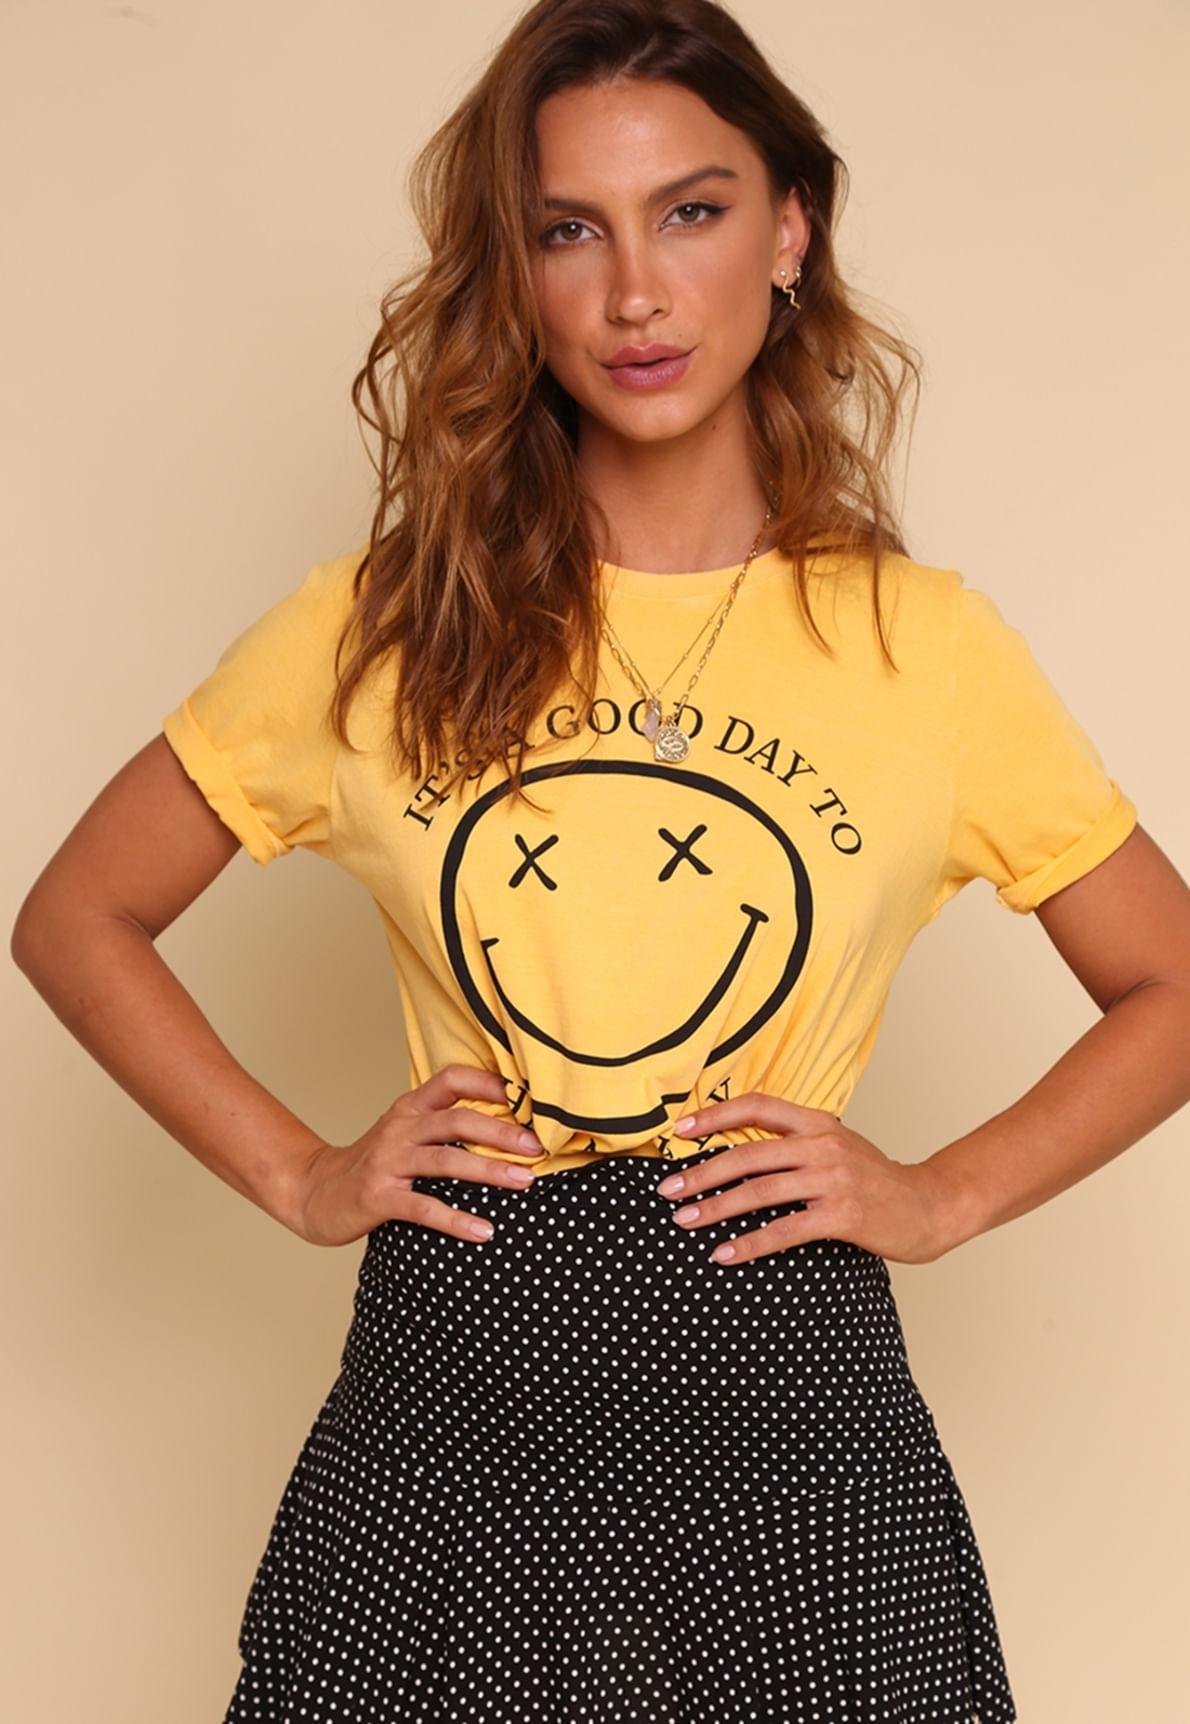 30913-t-shirt-its-a-good-day-mundo-lolita-01